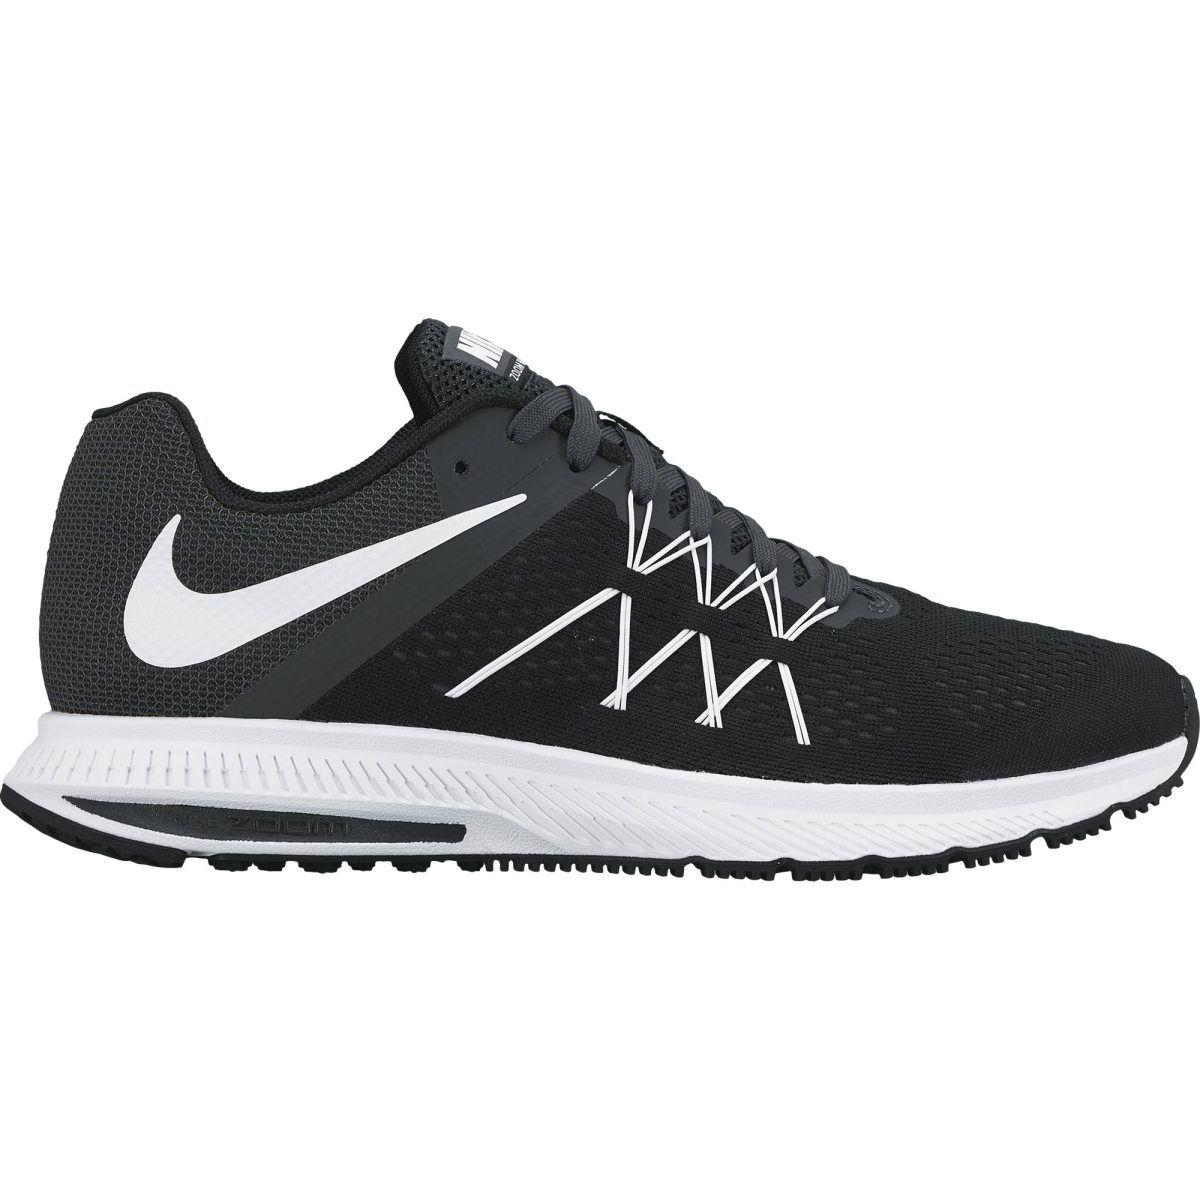 best sneakers 70145 b7ab2 ... black and white green ba886 61aa8  cheapest læs mere nike zoom winflo 3  løbesko herre. du kan trygt handle hos os